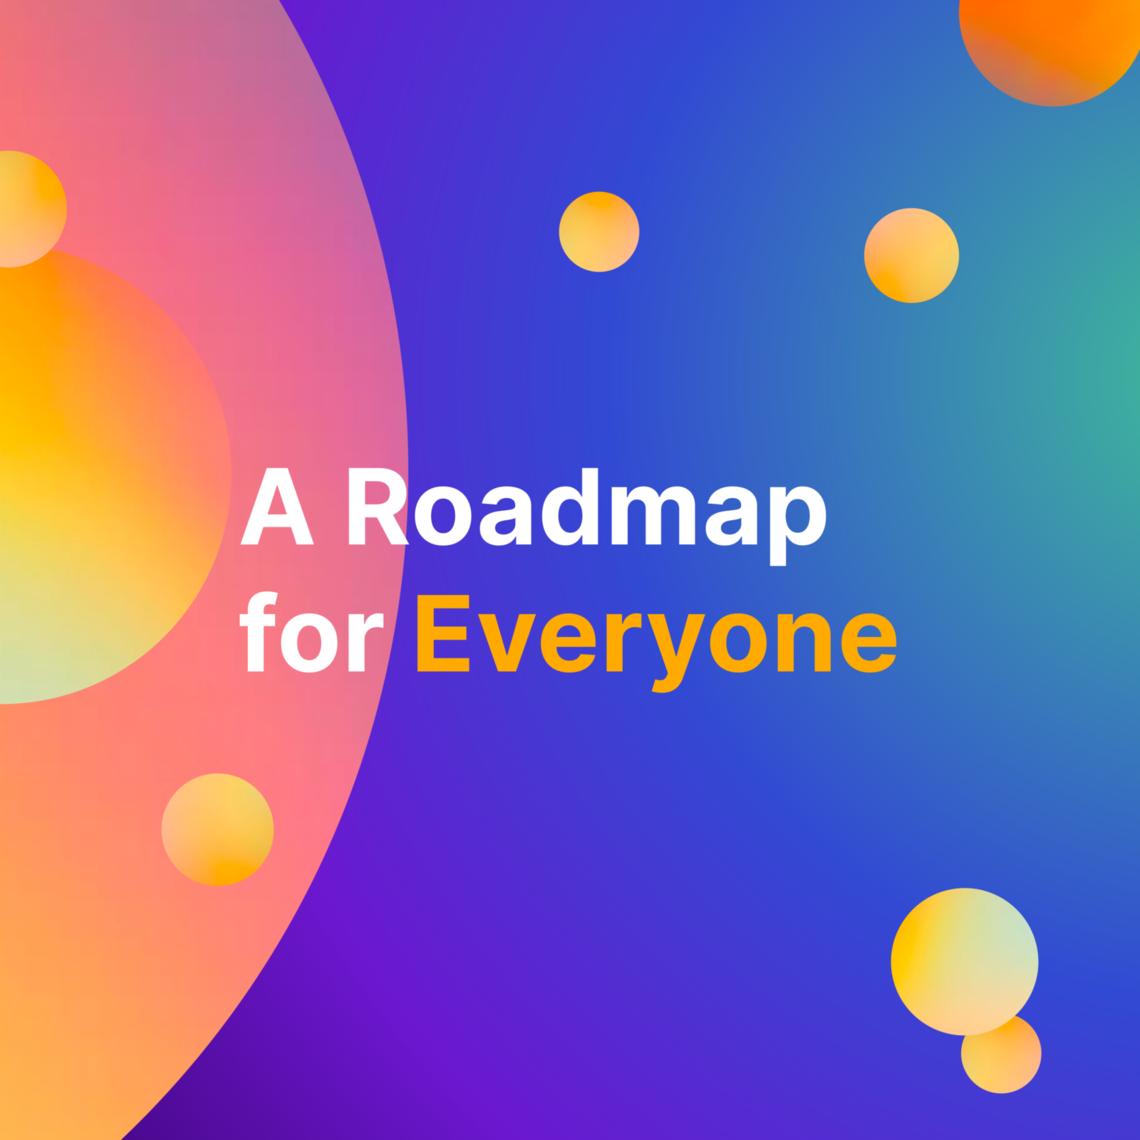 roadmap square